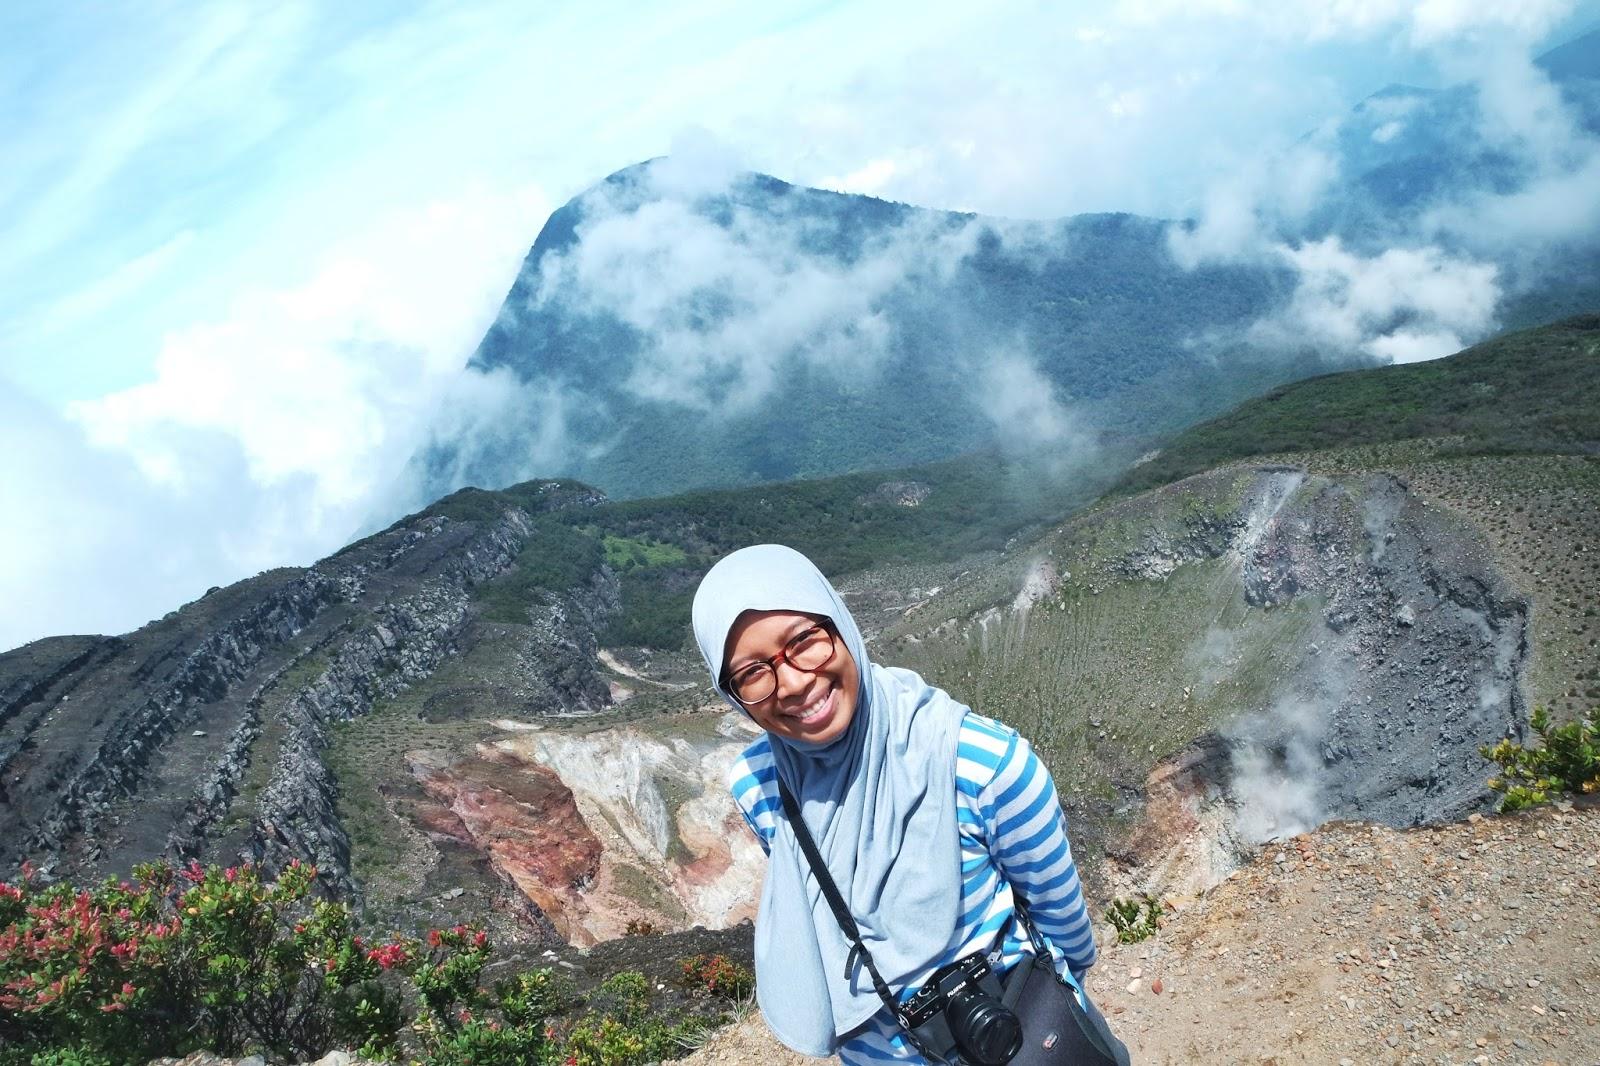 Asyik ada di Puncak Gunung Gede yihaaaaa